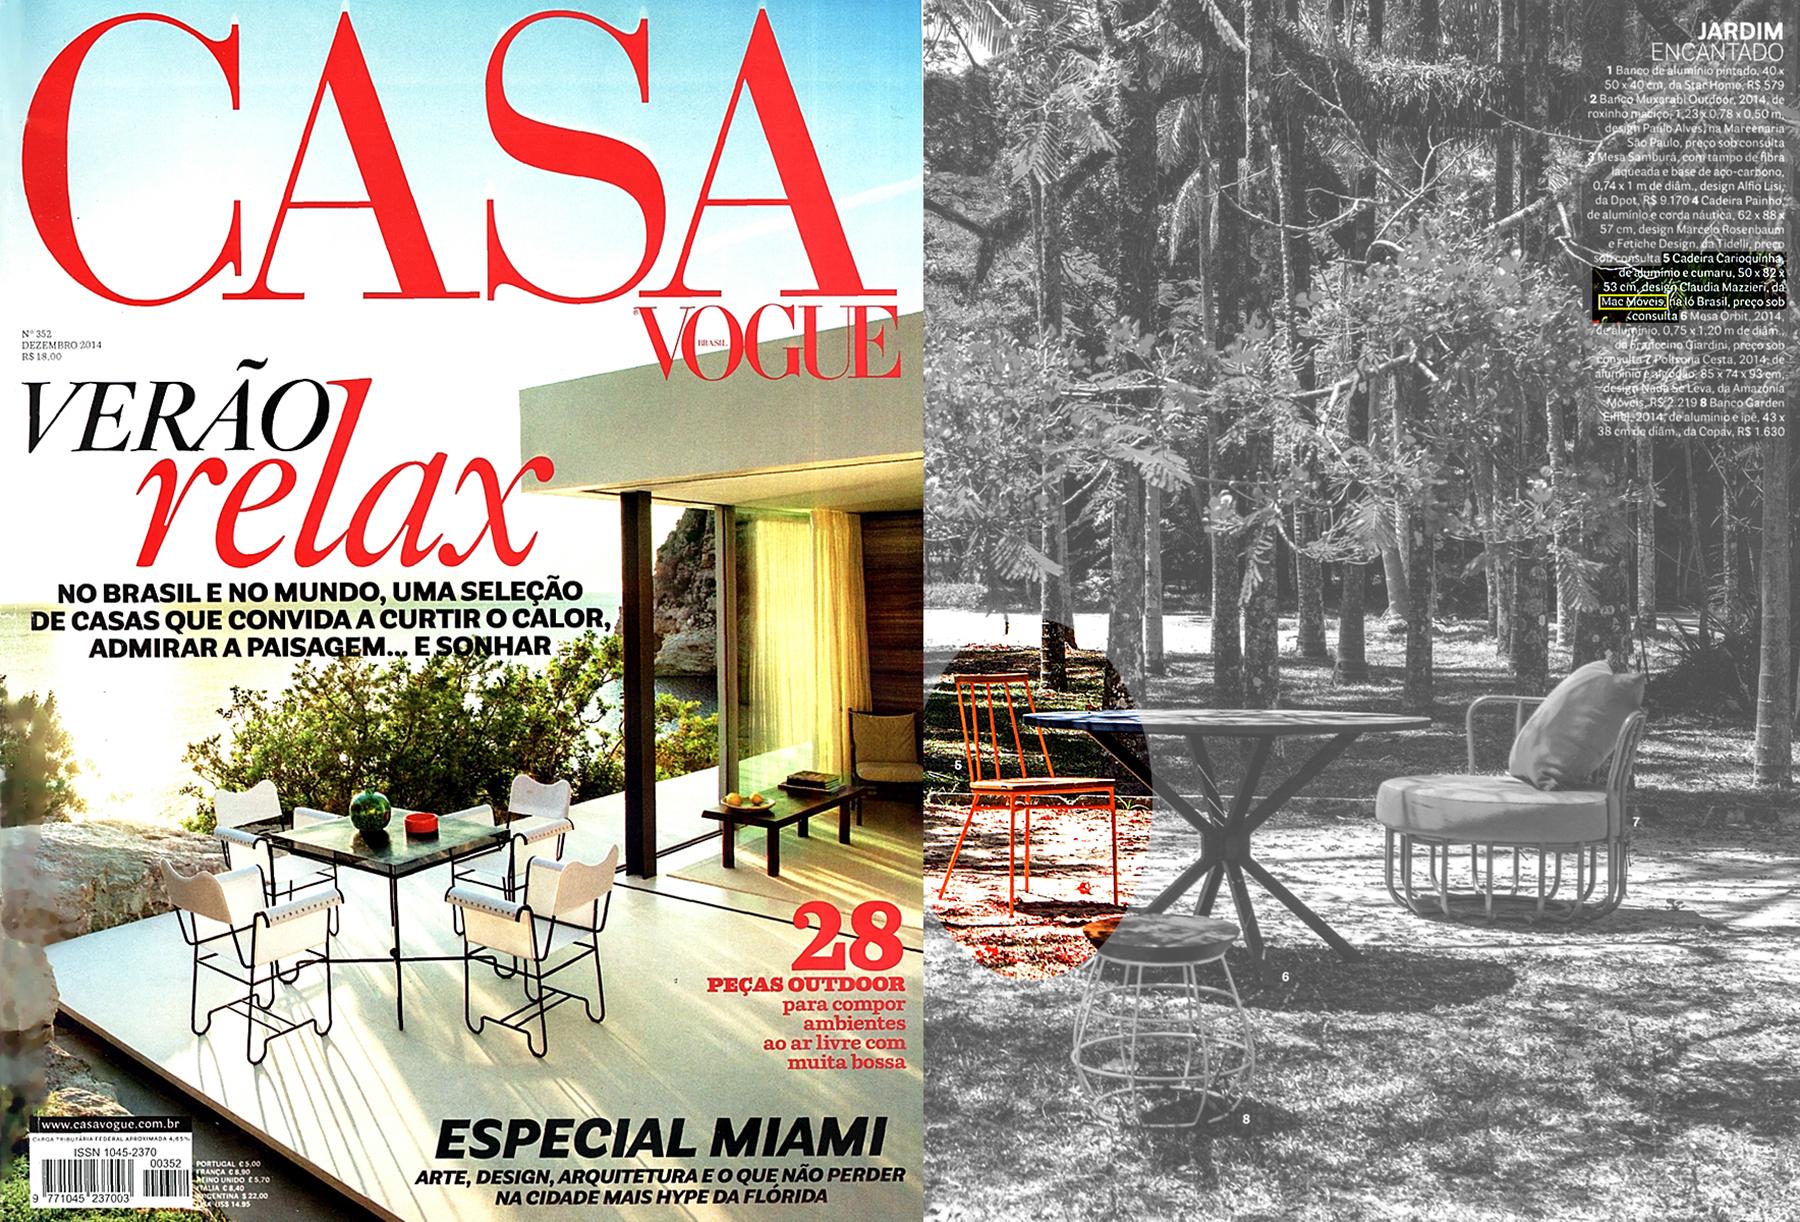 Casa Vogue nº 352 - December 2014